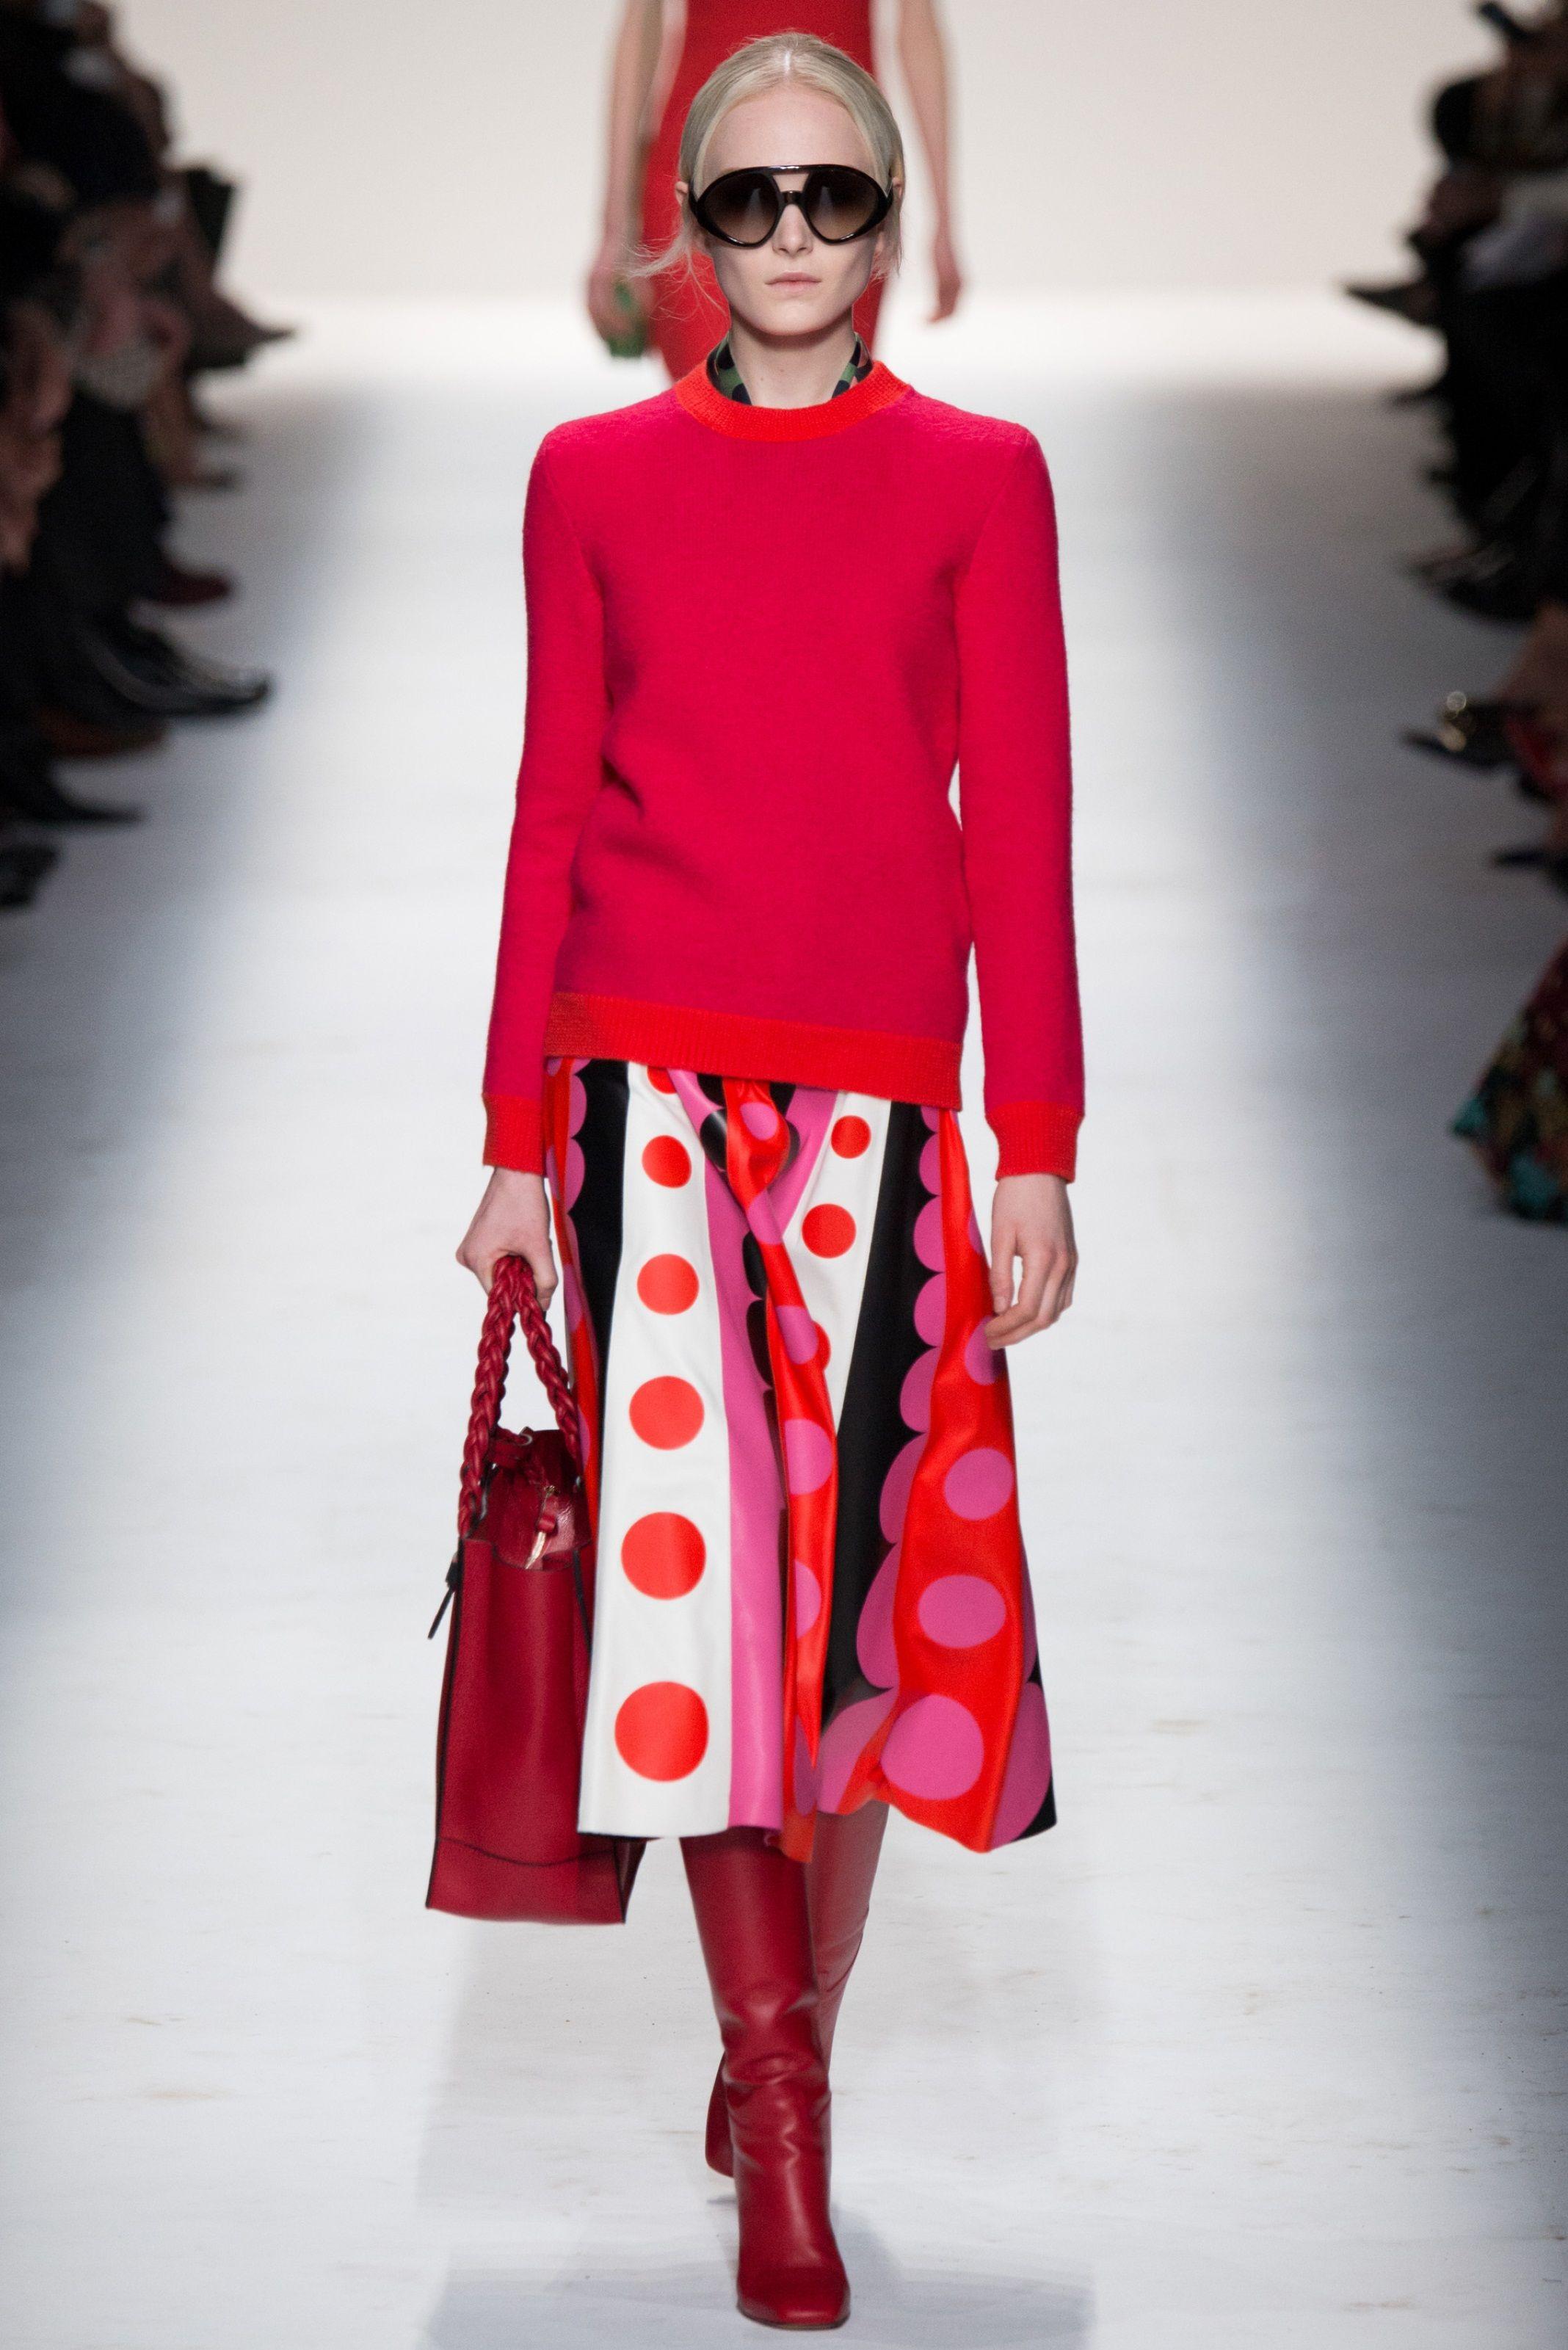 Valentino FallWinter 2014-2015 Collection – Paris Fashion Week forecast